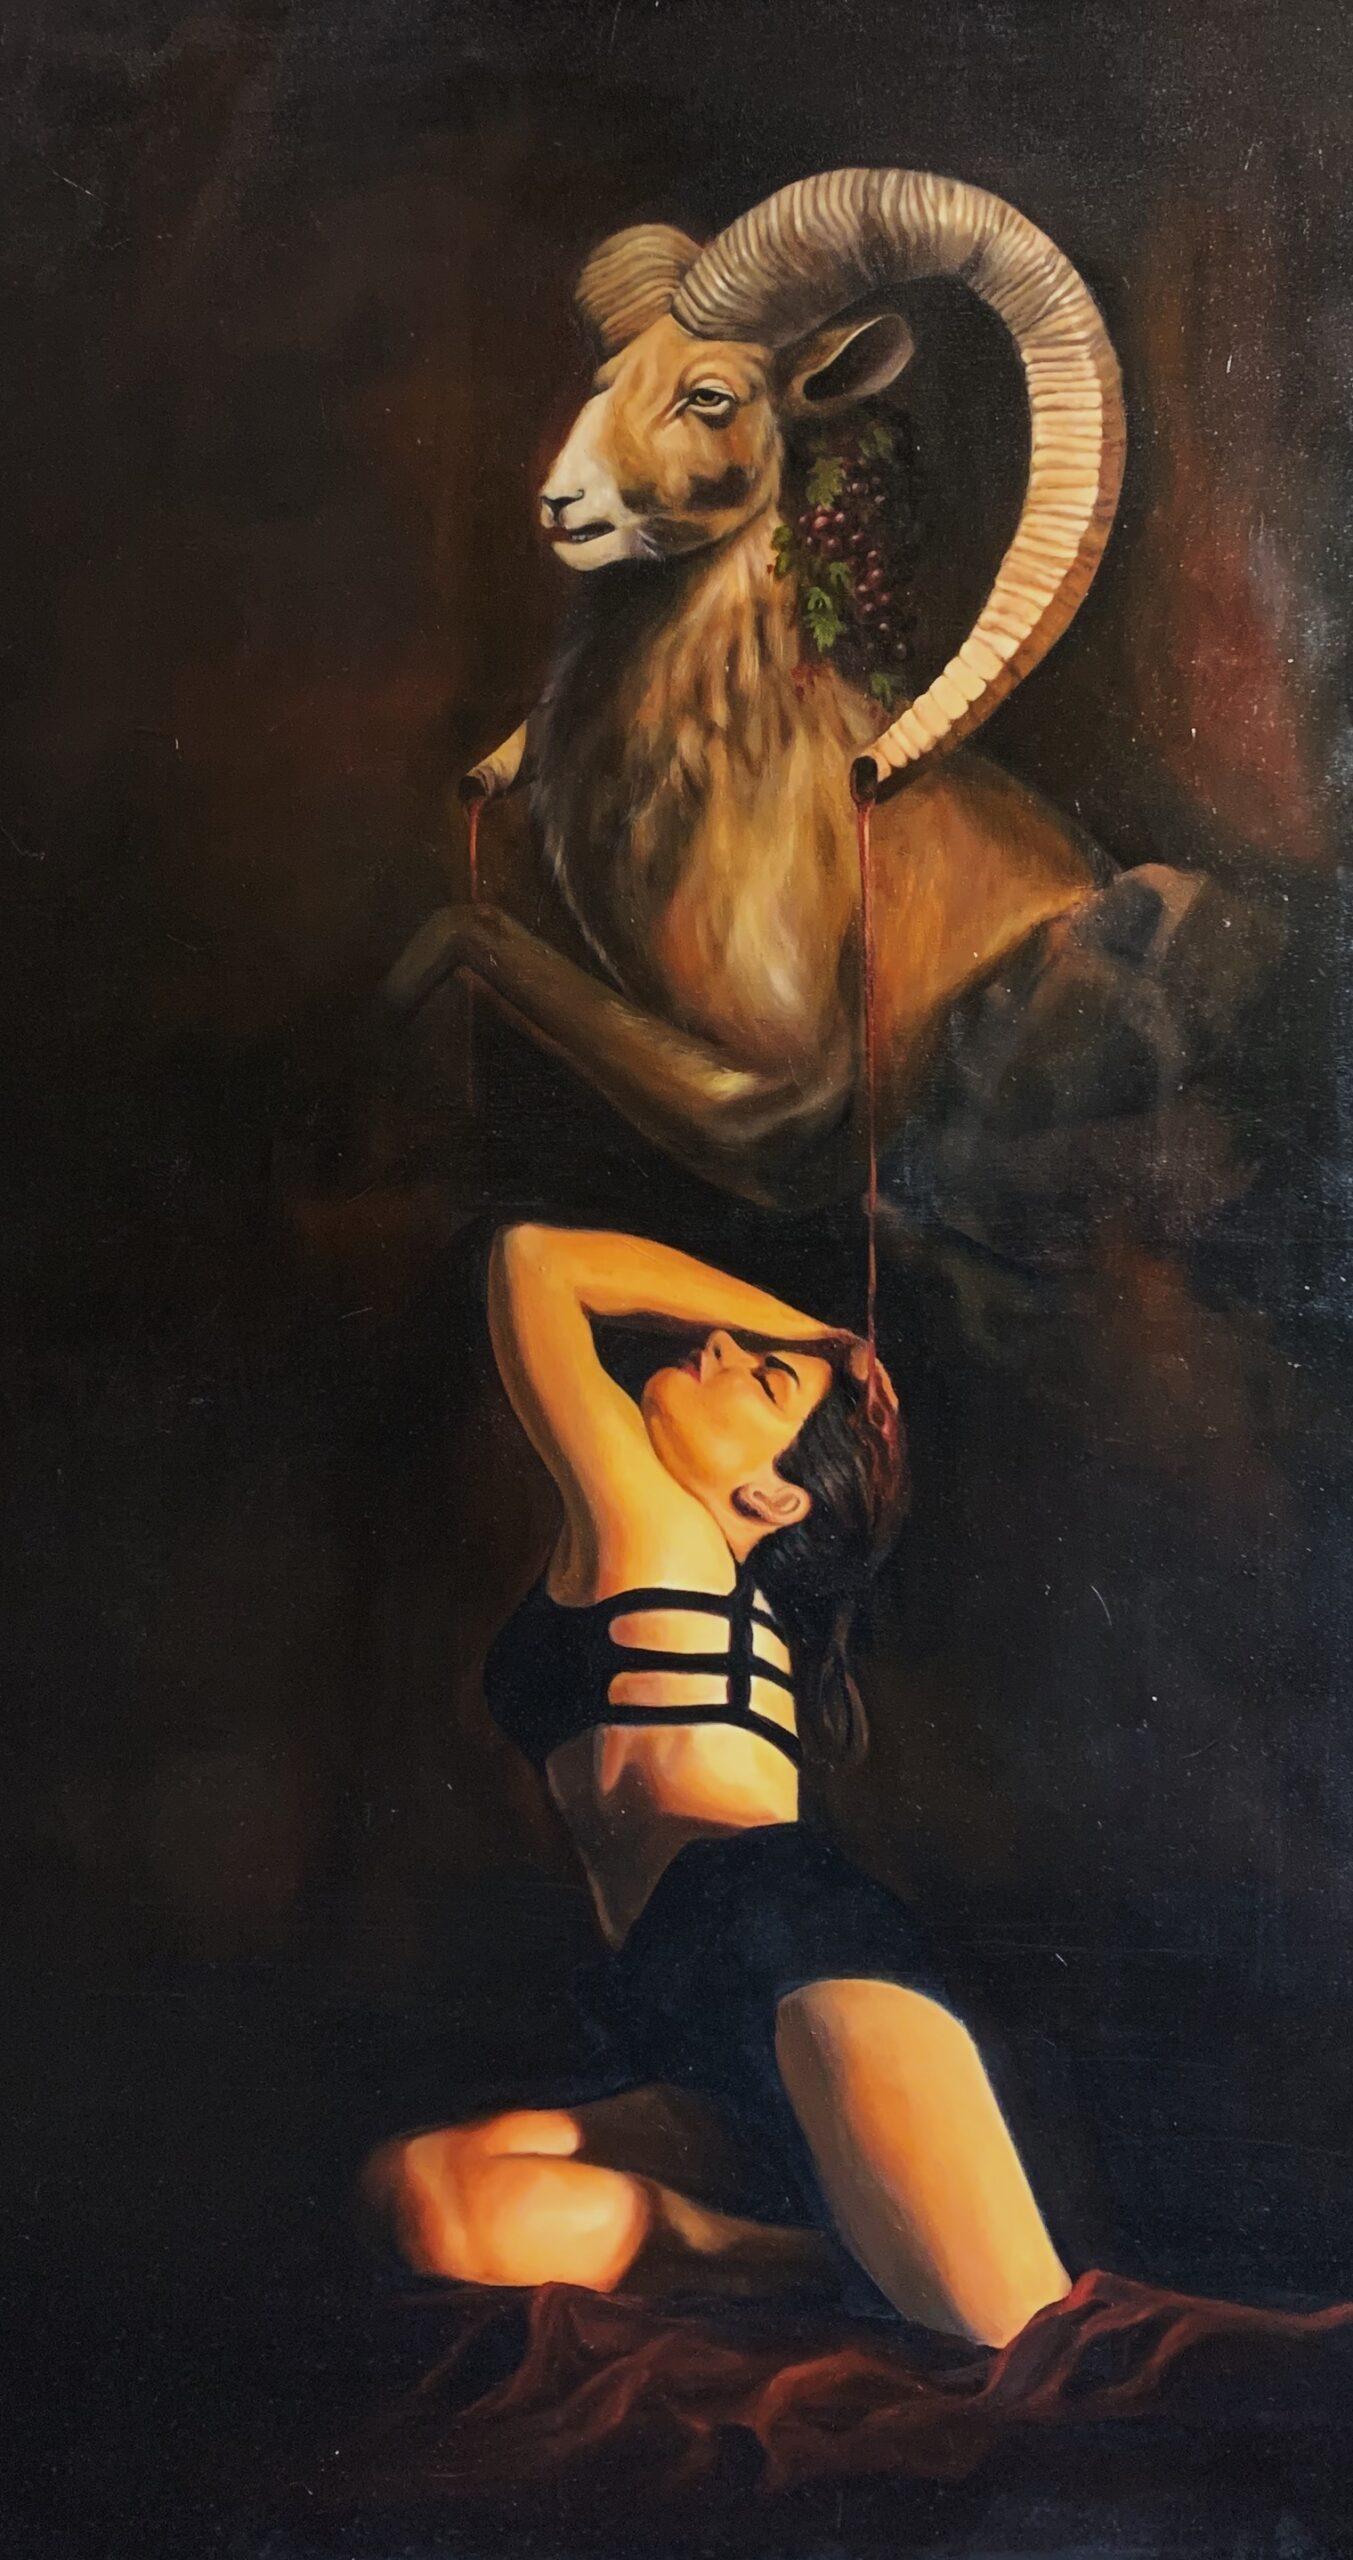 Araimish Malik<br></br>Paradiso Lost<br></br>Oil On Canvas<br></br>60x48 inches